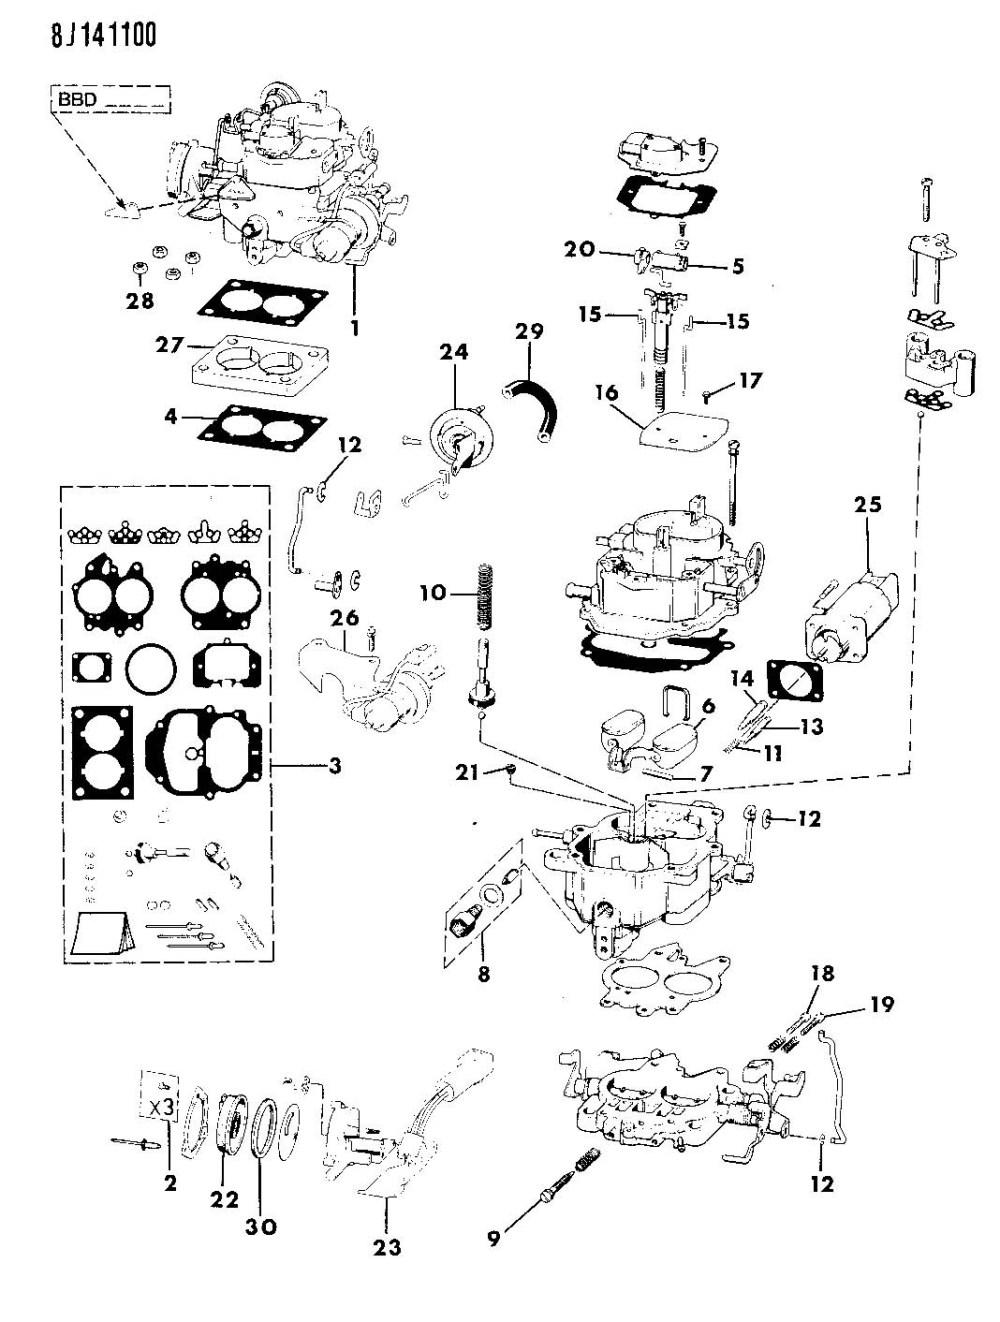 medium resolution of 1987 jeep wrangler engine diagram schematic diagram lincoln vacuum diagram wiring library